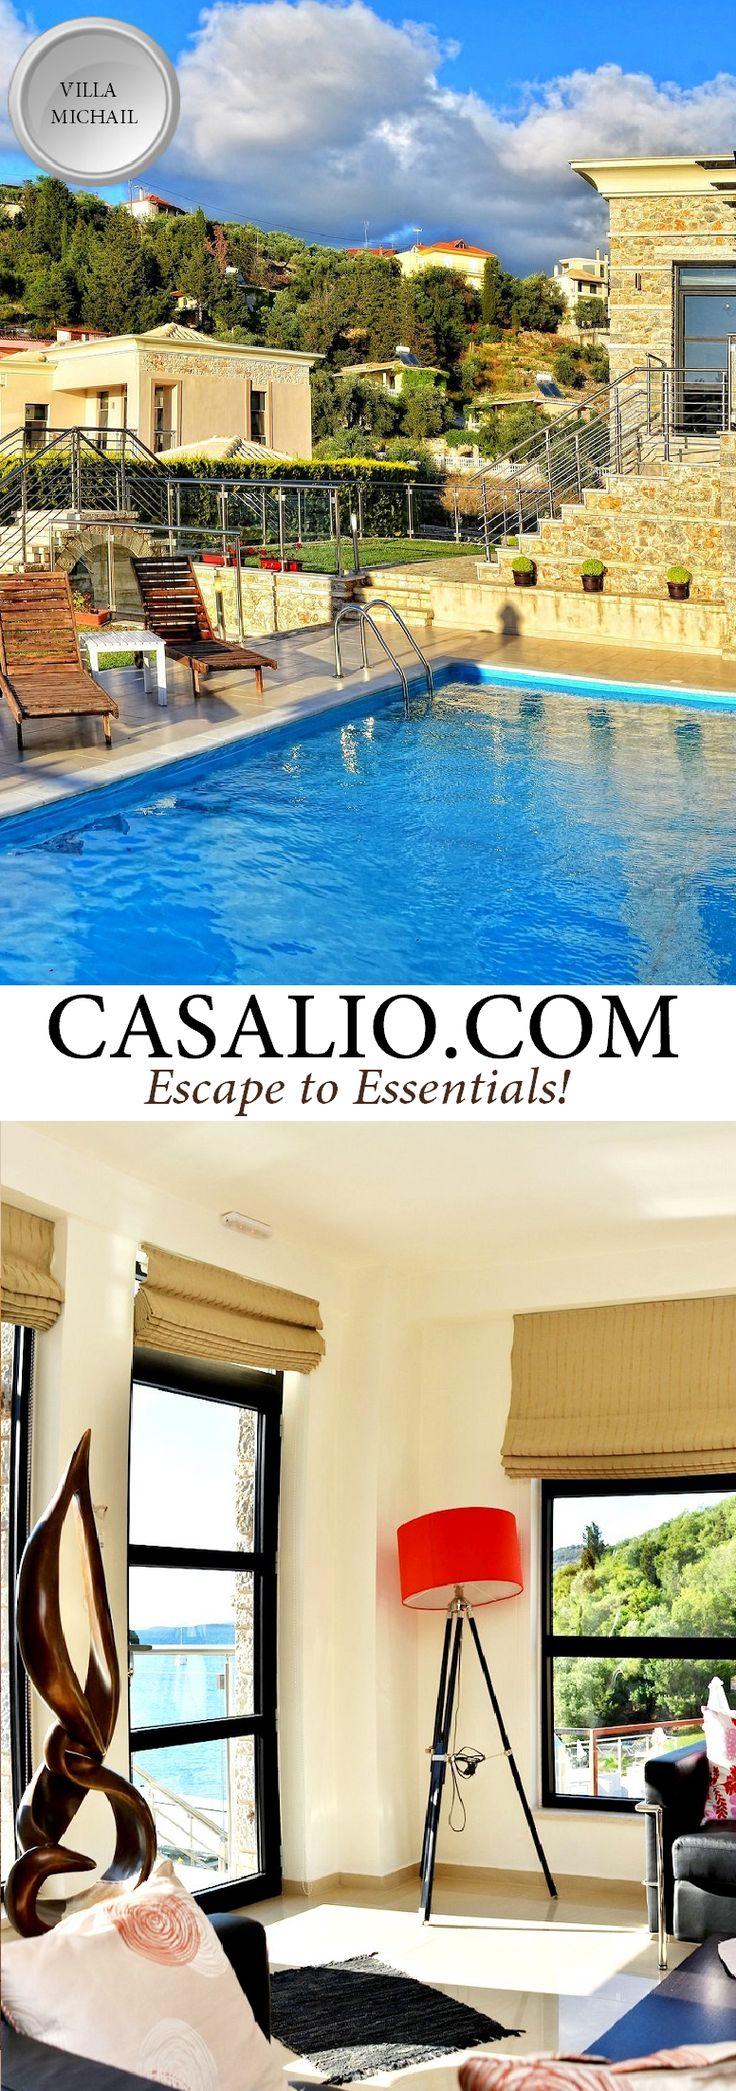 www.casalio.com    Villa Michail    Greece - Karvouno    Luxurious villa, fully airconditioned, Karvouno Beach, 2 bedrooms, private pool, seaview. #Luxury #Villas #LuxuryVillas #Greece #Karvouno #BeachFront #BeachVacation #Rental #LuxuryTravel #Travel #LuxuryLife #LuxuryLifeStyle #LuxuryTravel #luxuryhotels (Pinned by #Casalio - www.casalio.com) Our travel blog - www.casaliotravel.com